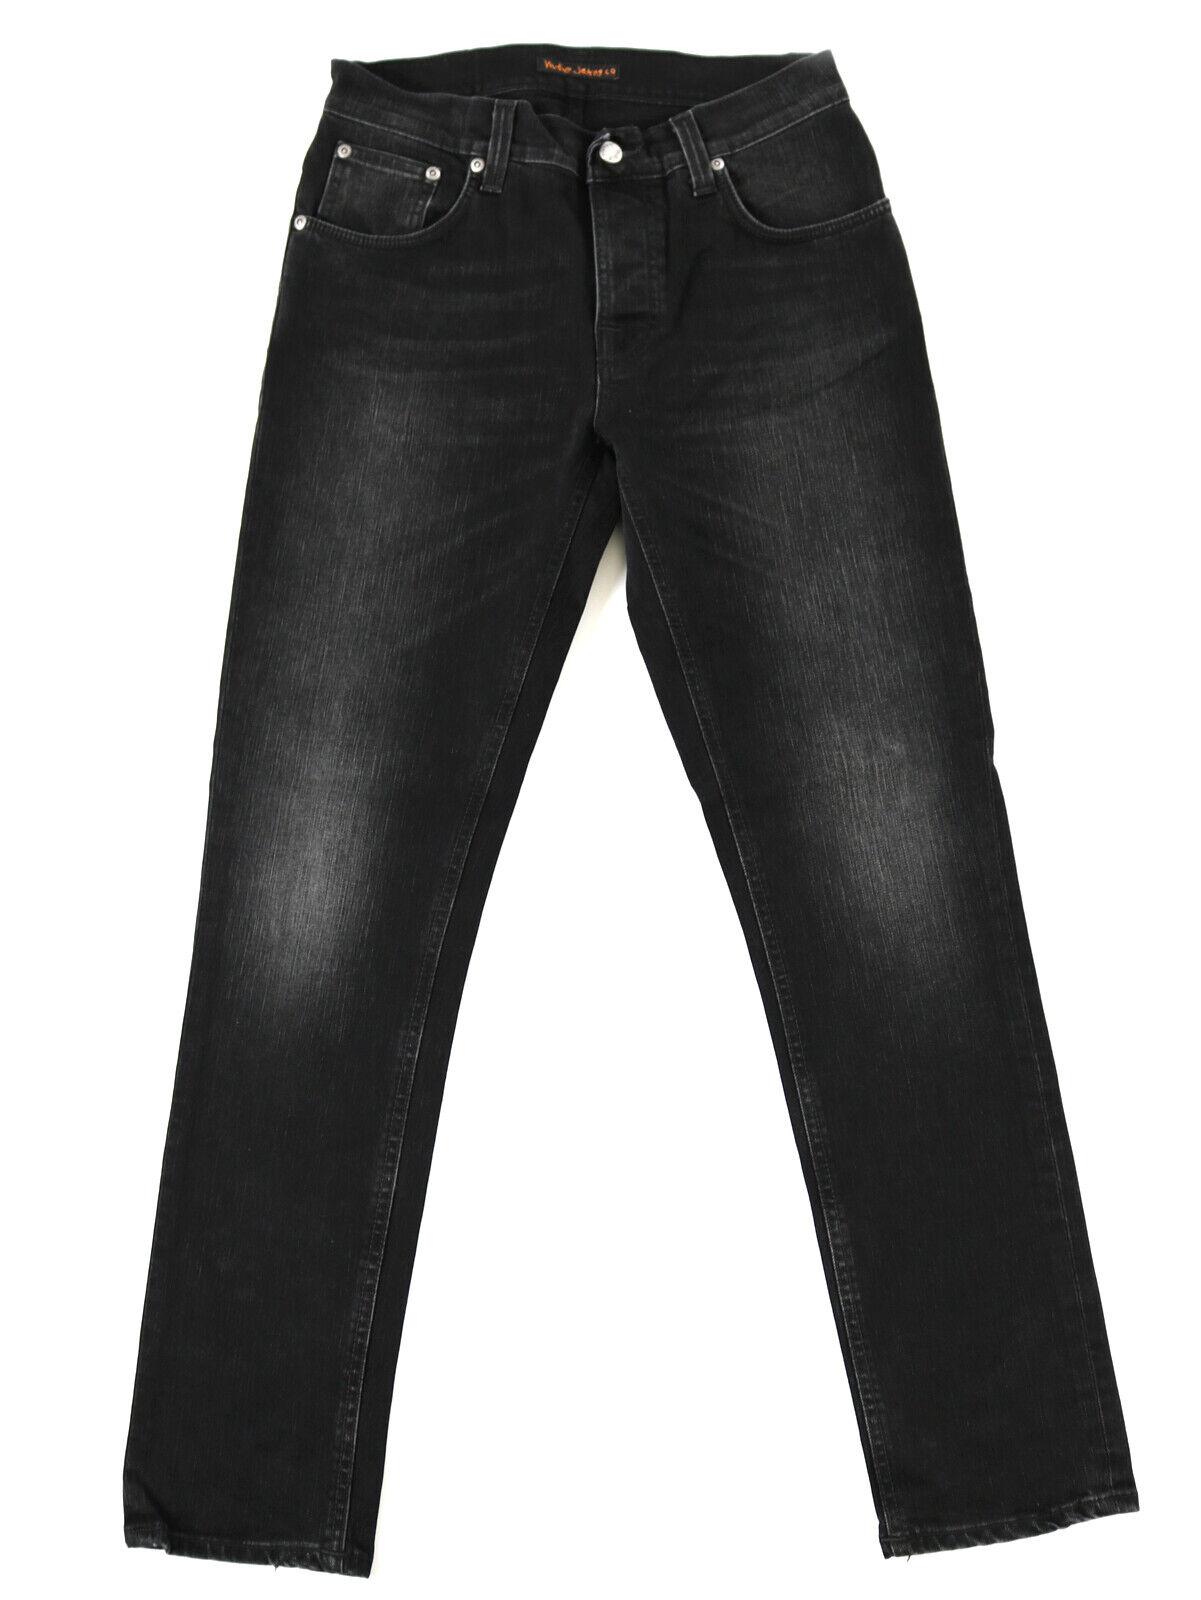 Nudie Herren Slim Fit Jeans-Hose     Grim Tim schwarz Fall  W30 L30  Stretch 5df021